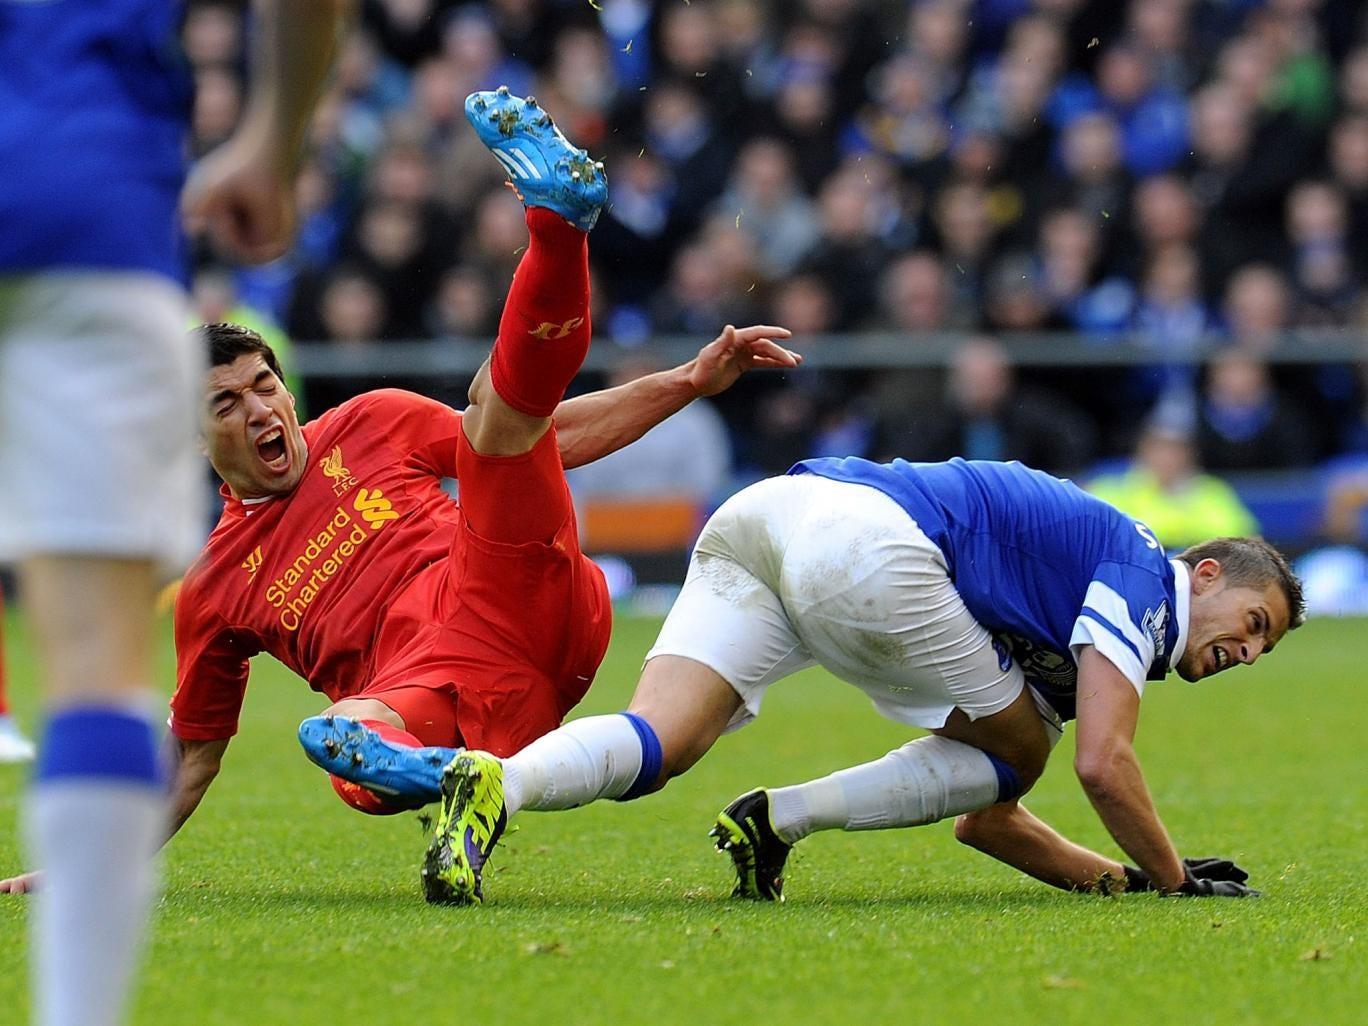 Kevin Mirallas of Everton tackles Luis Suarez of Liverpool